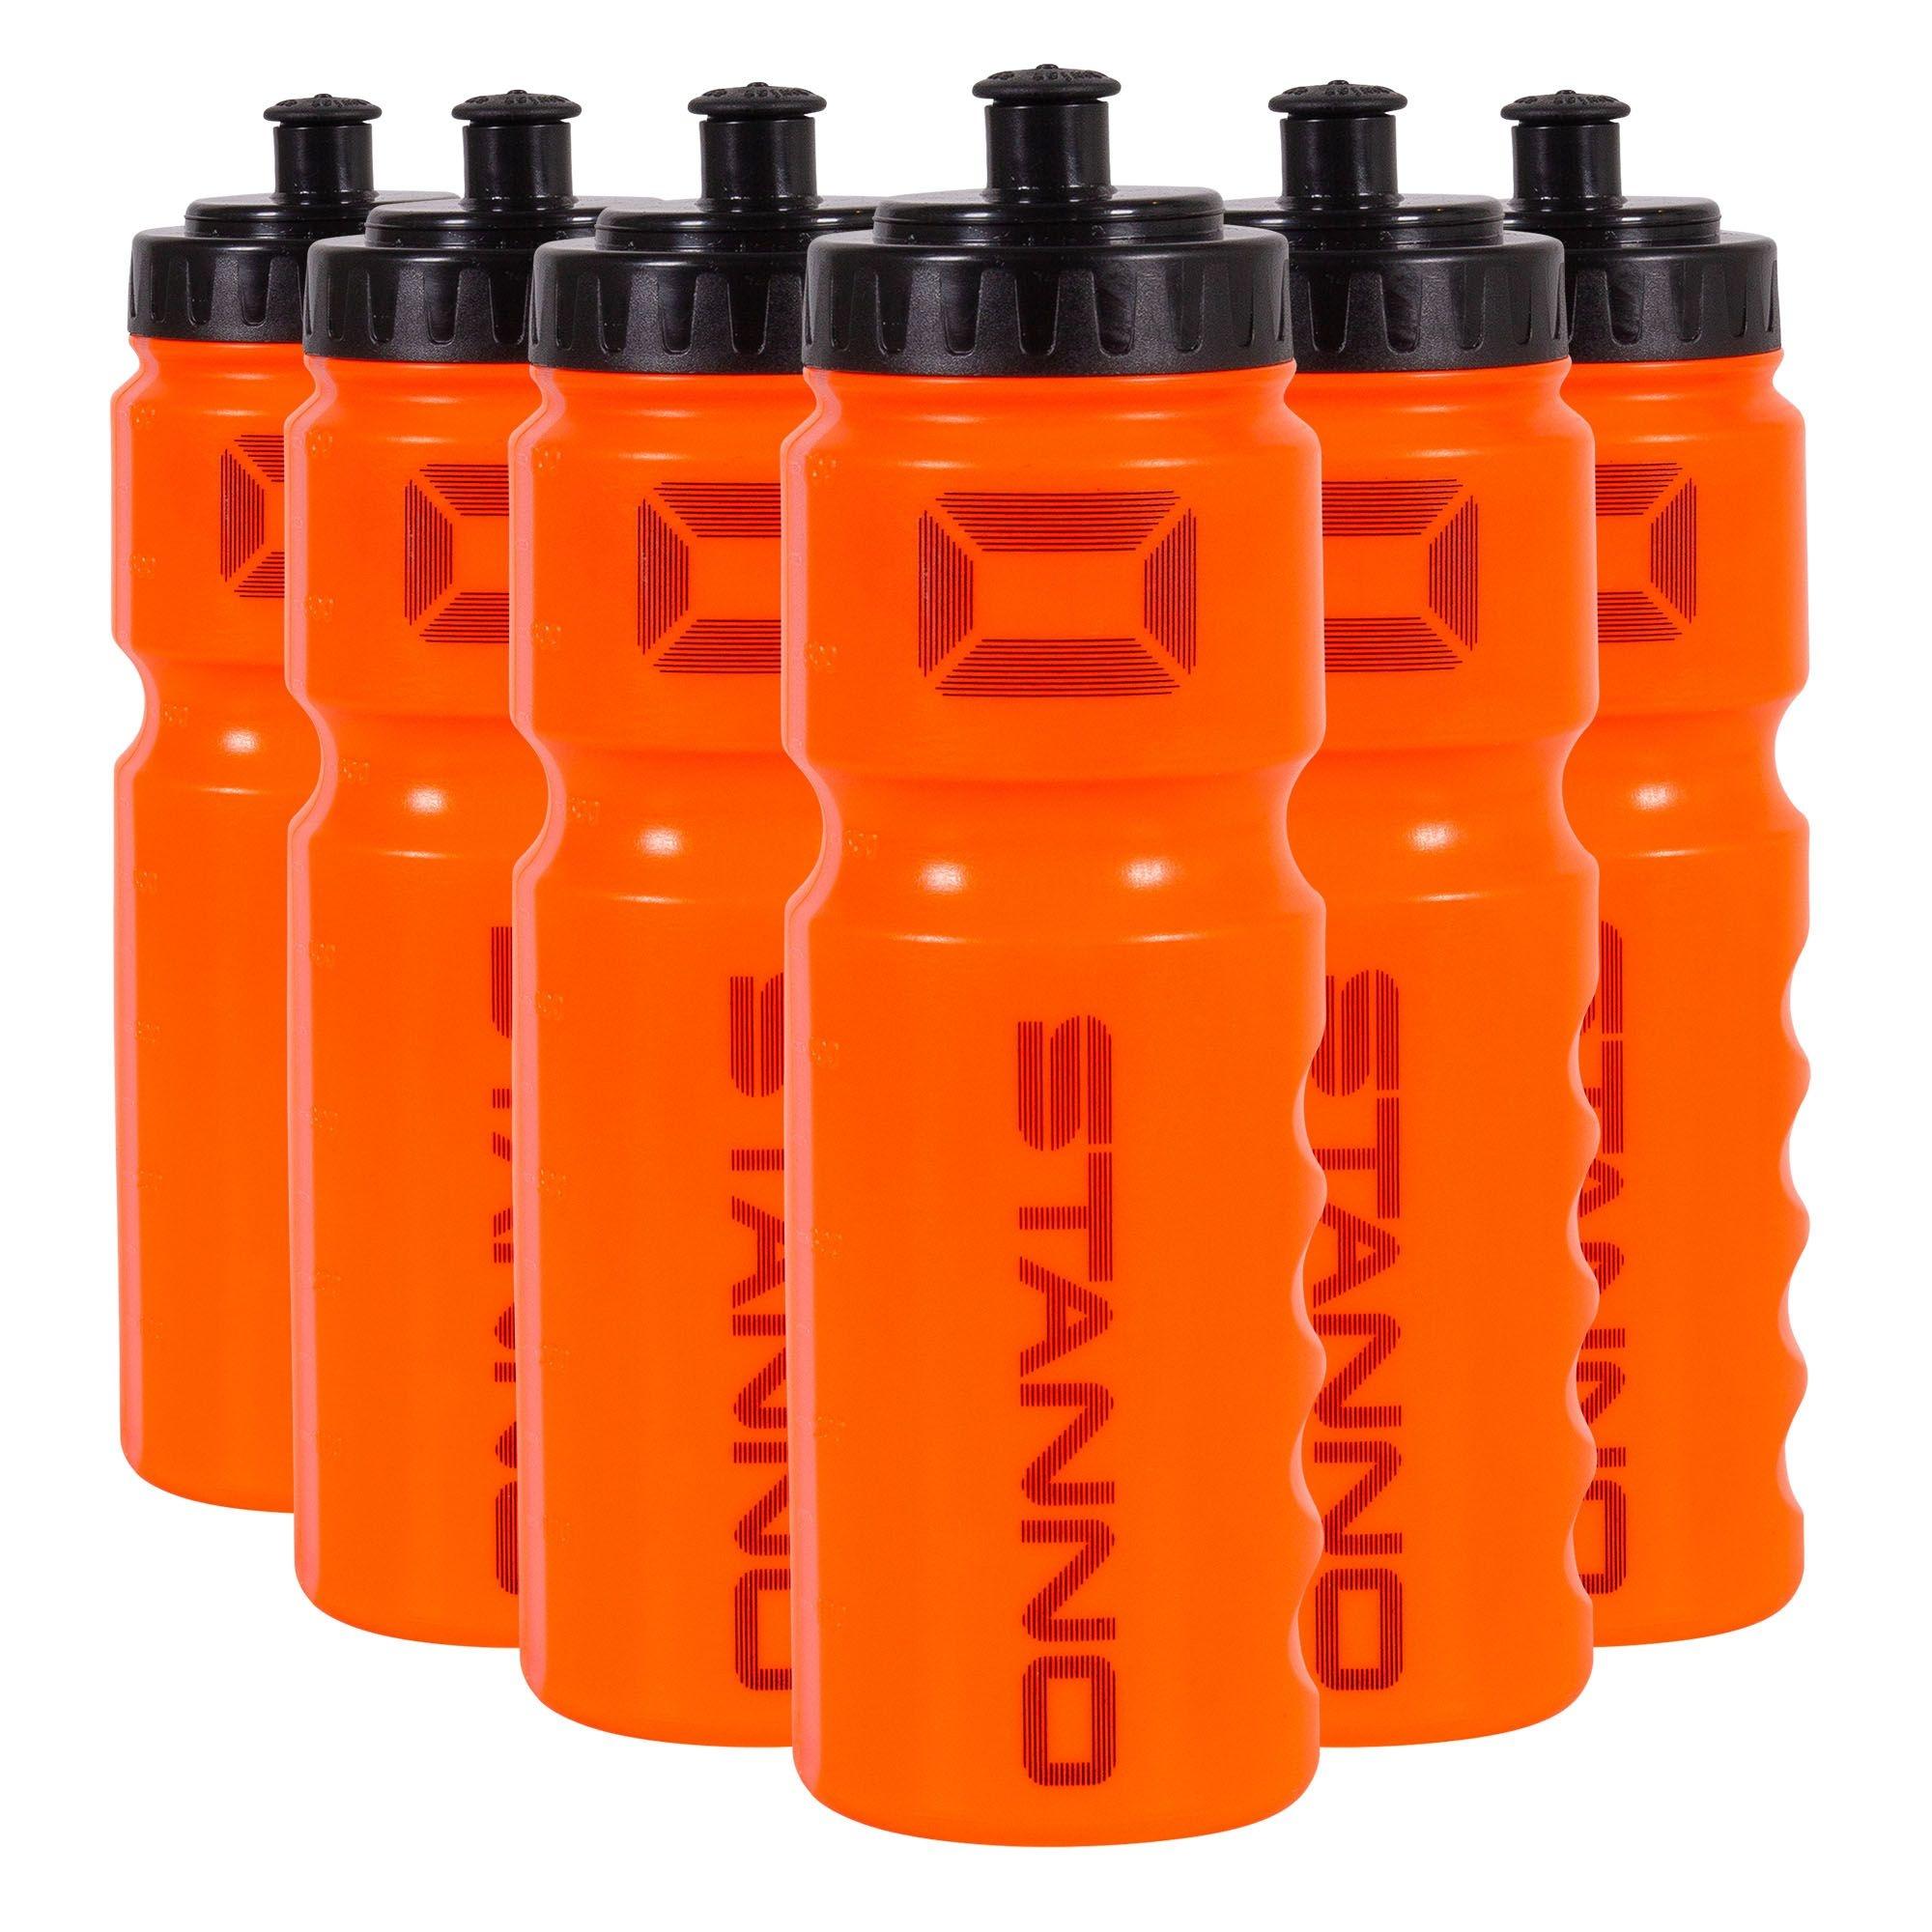 Stanno Athlete Bidon Set (6 stuks) Oranje